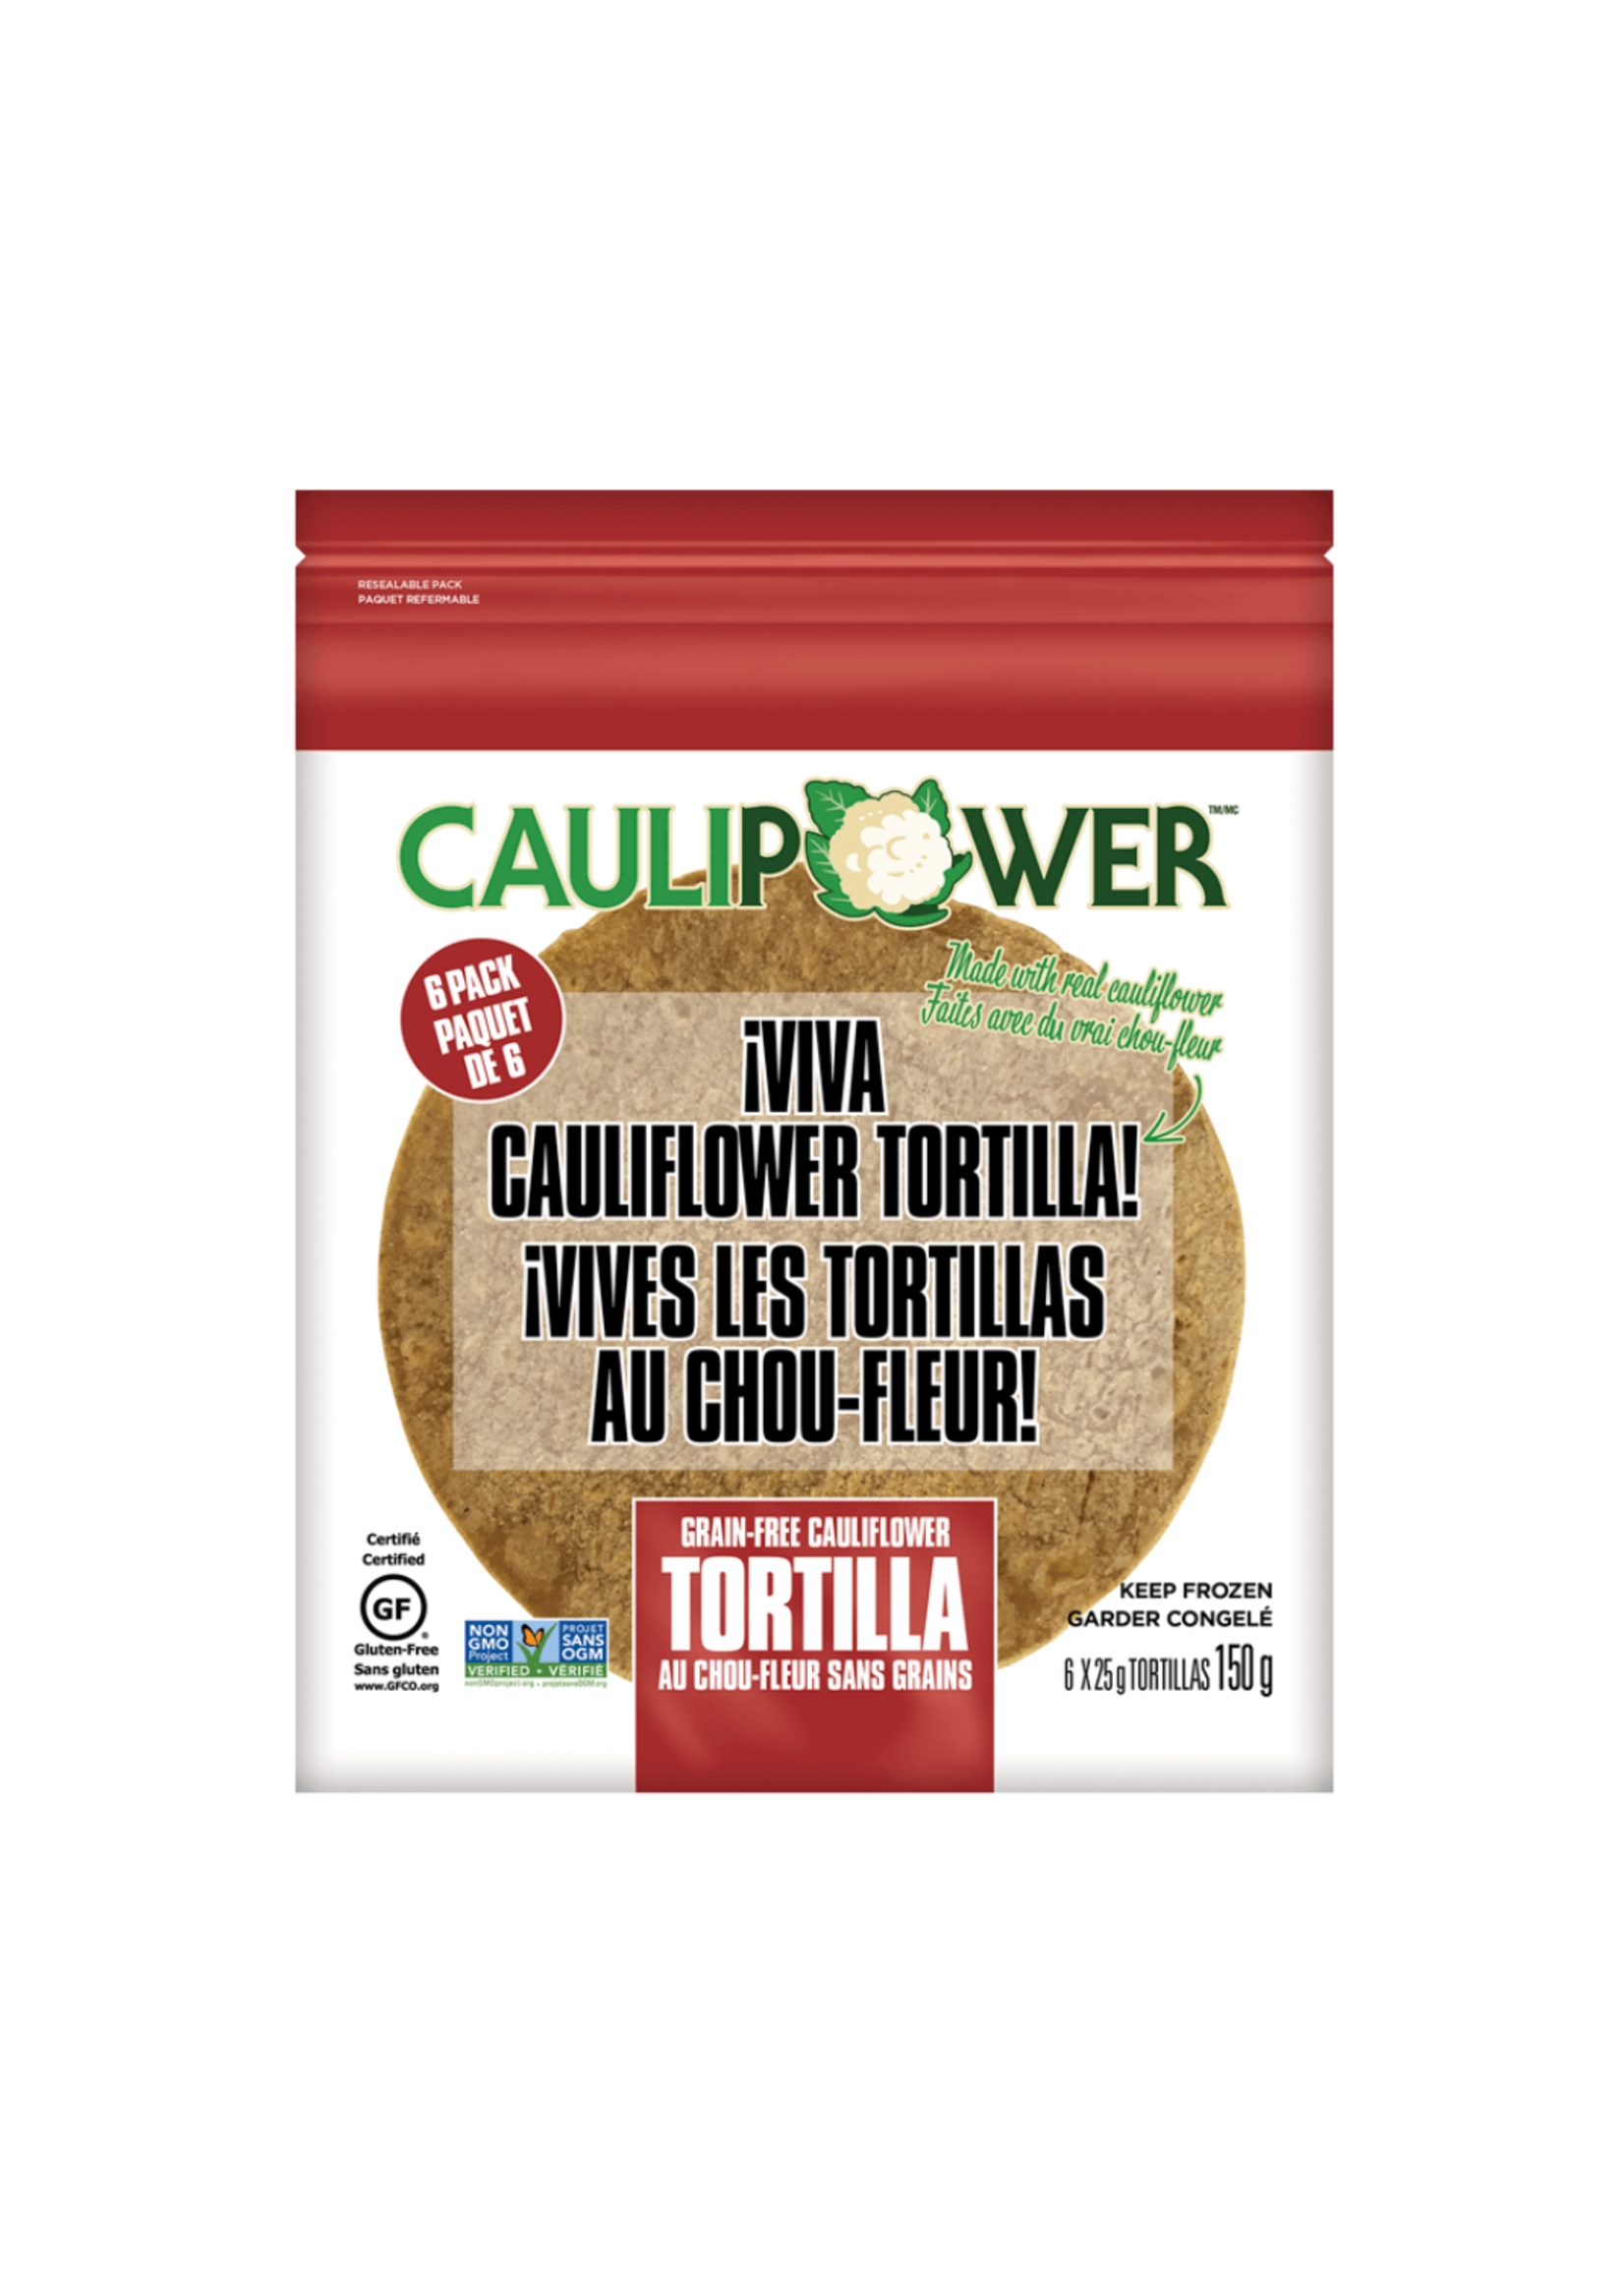 CAULIPOWER CAULIPOWER- Grain Free Cauliflower Tortilla (6 Ct)